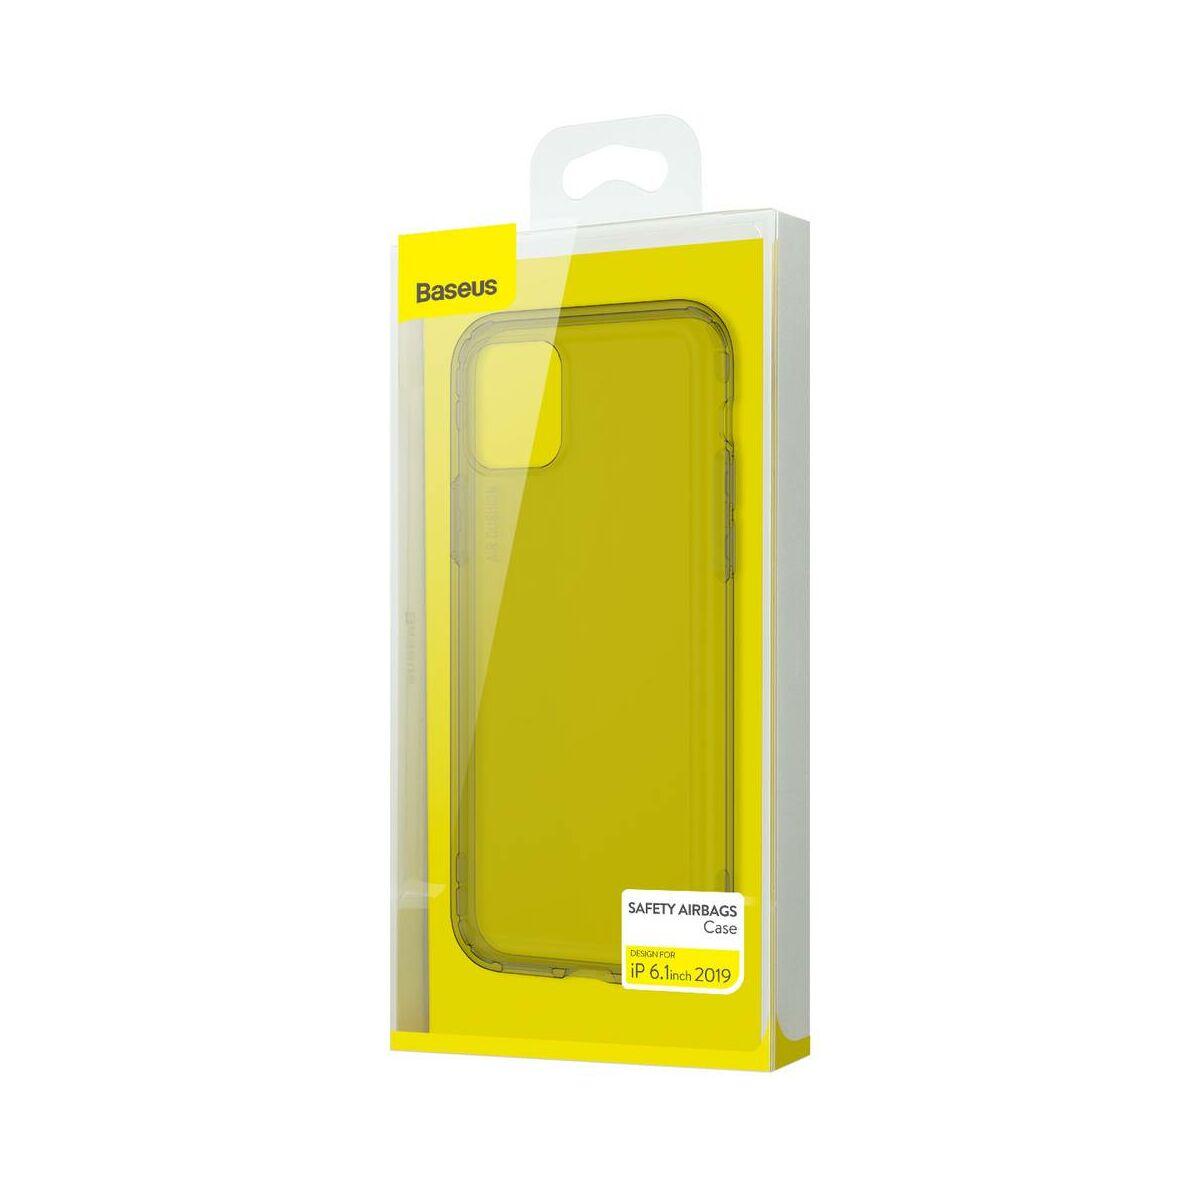 Baseus iPhone 11 tok, Safety Airbags, átlátszó fekete (ARAPIPH61S-SF01)